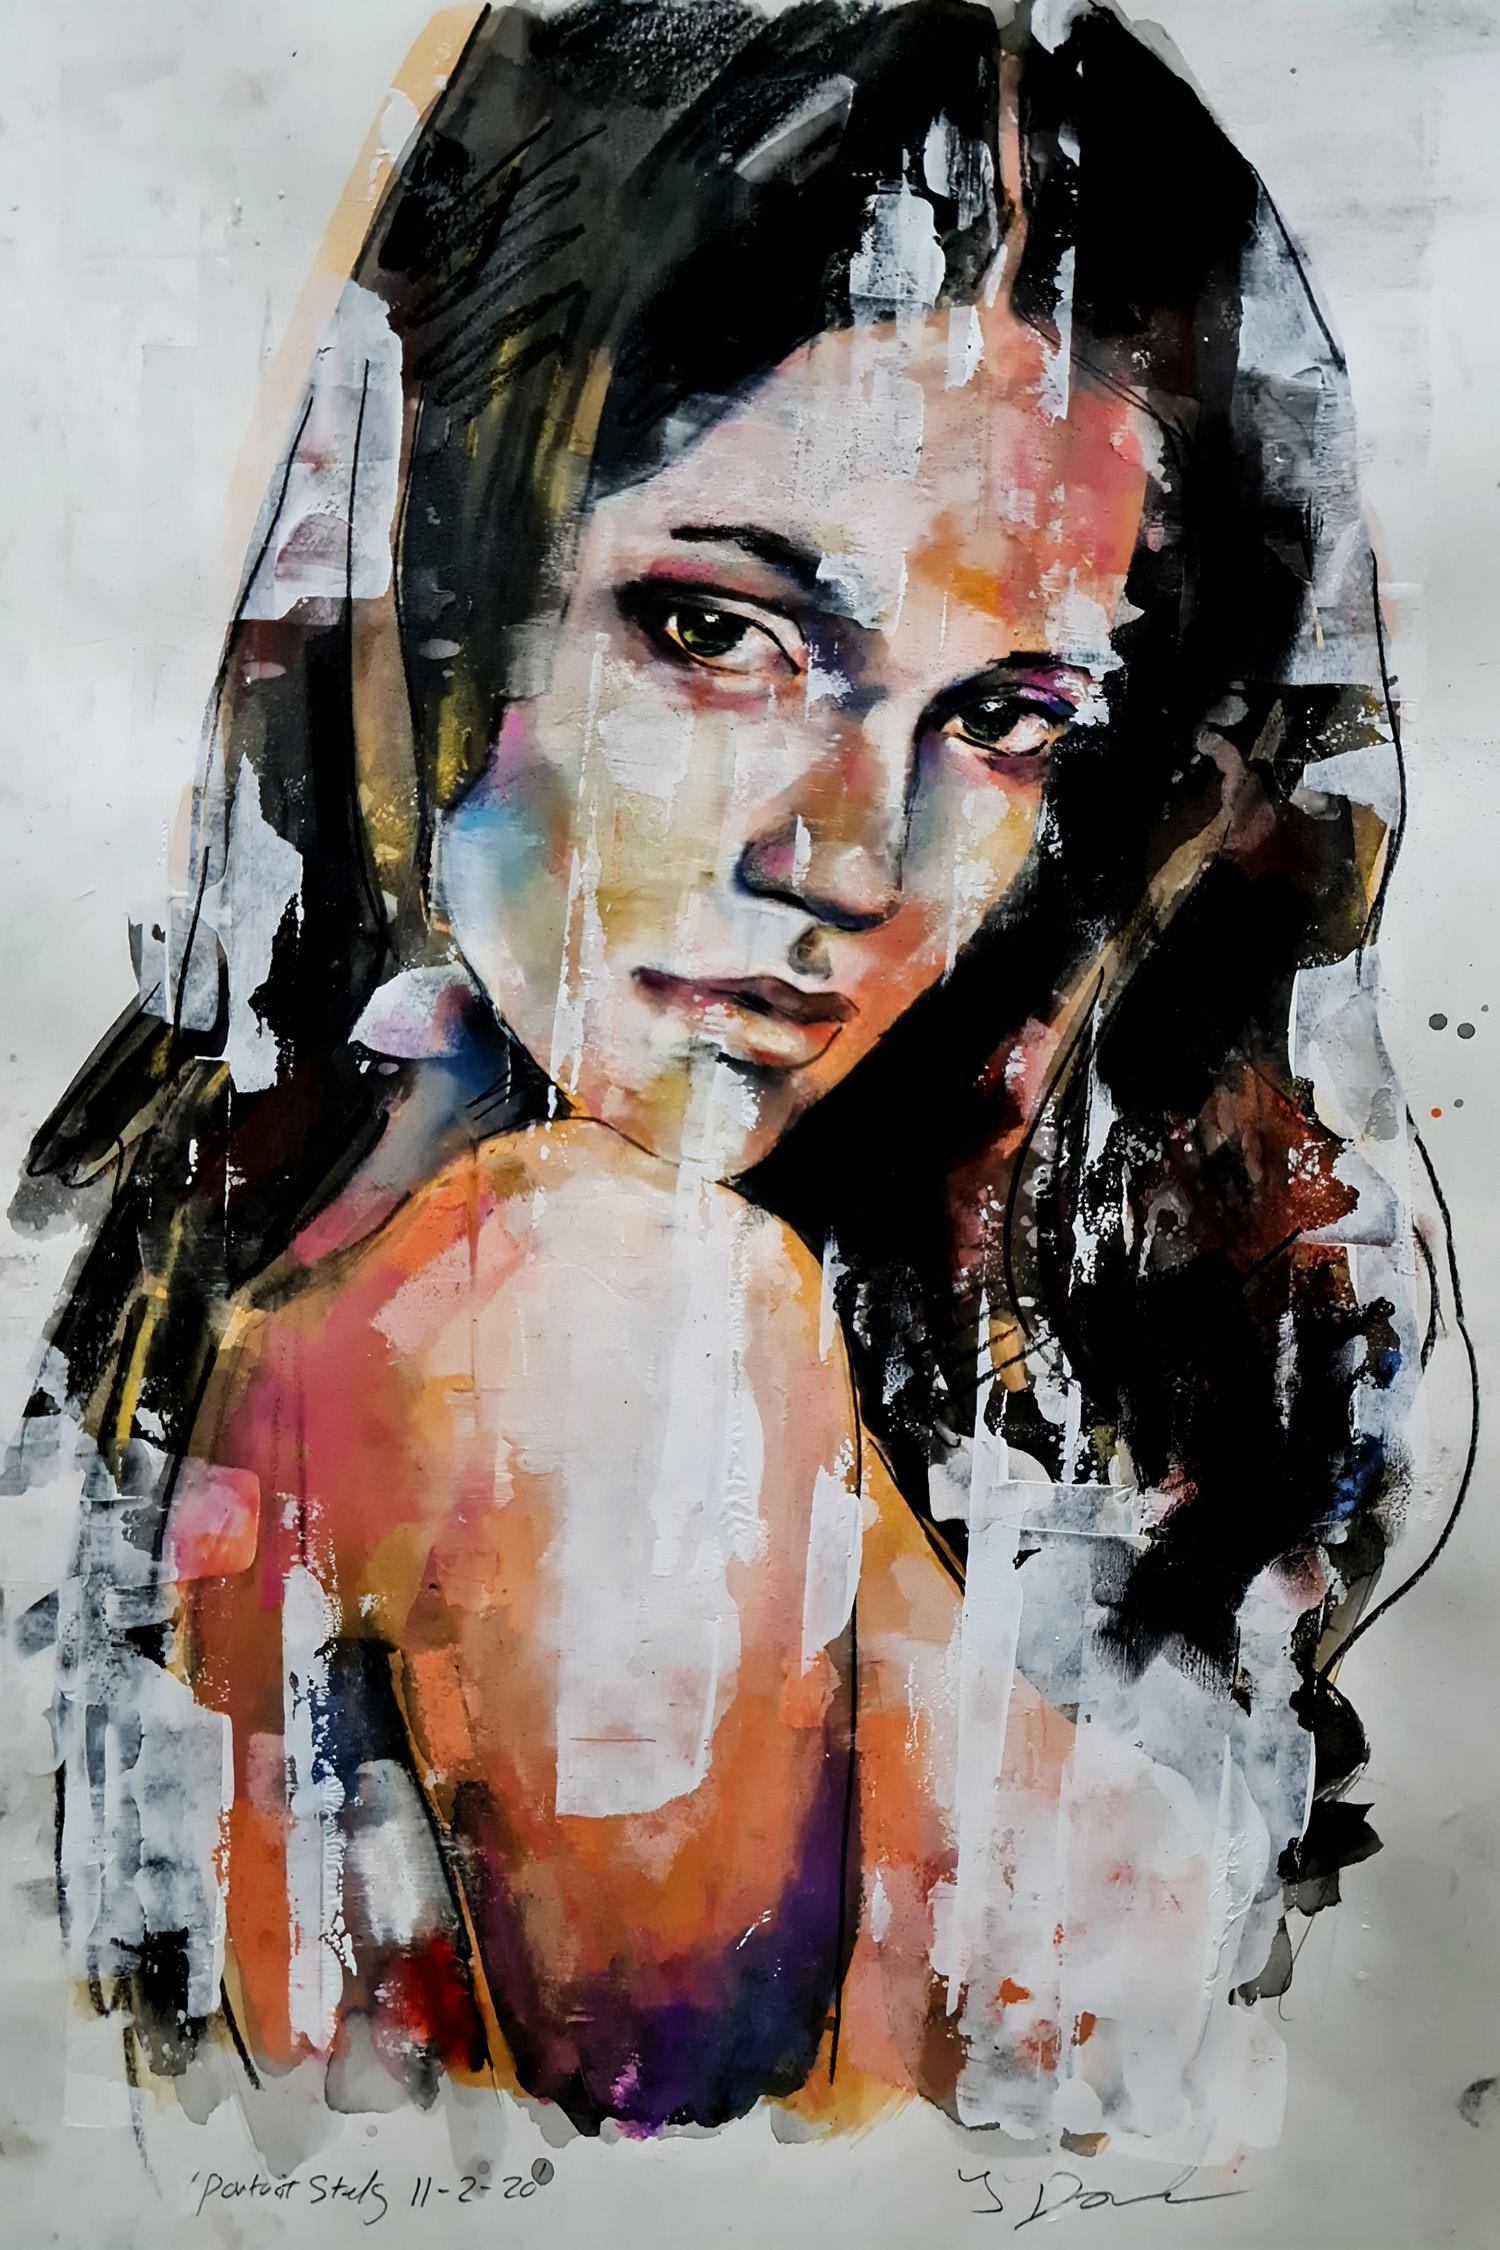 portrait study 11-2-20